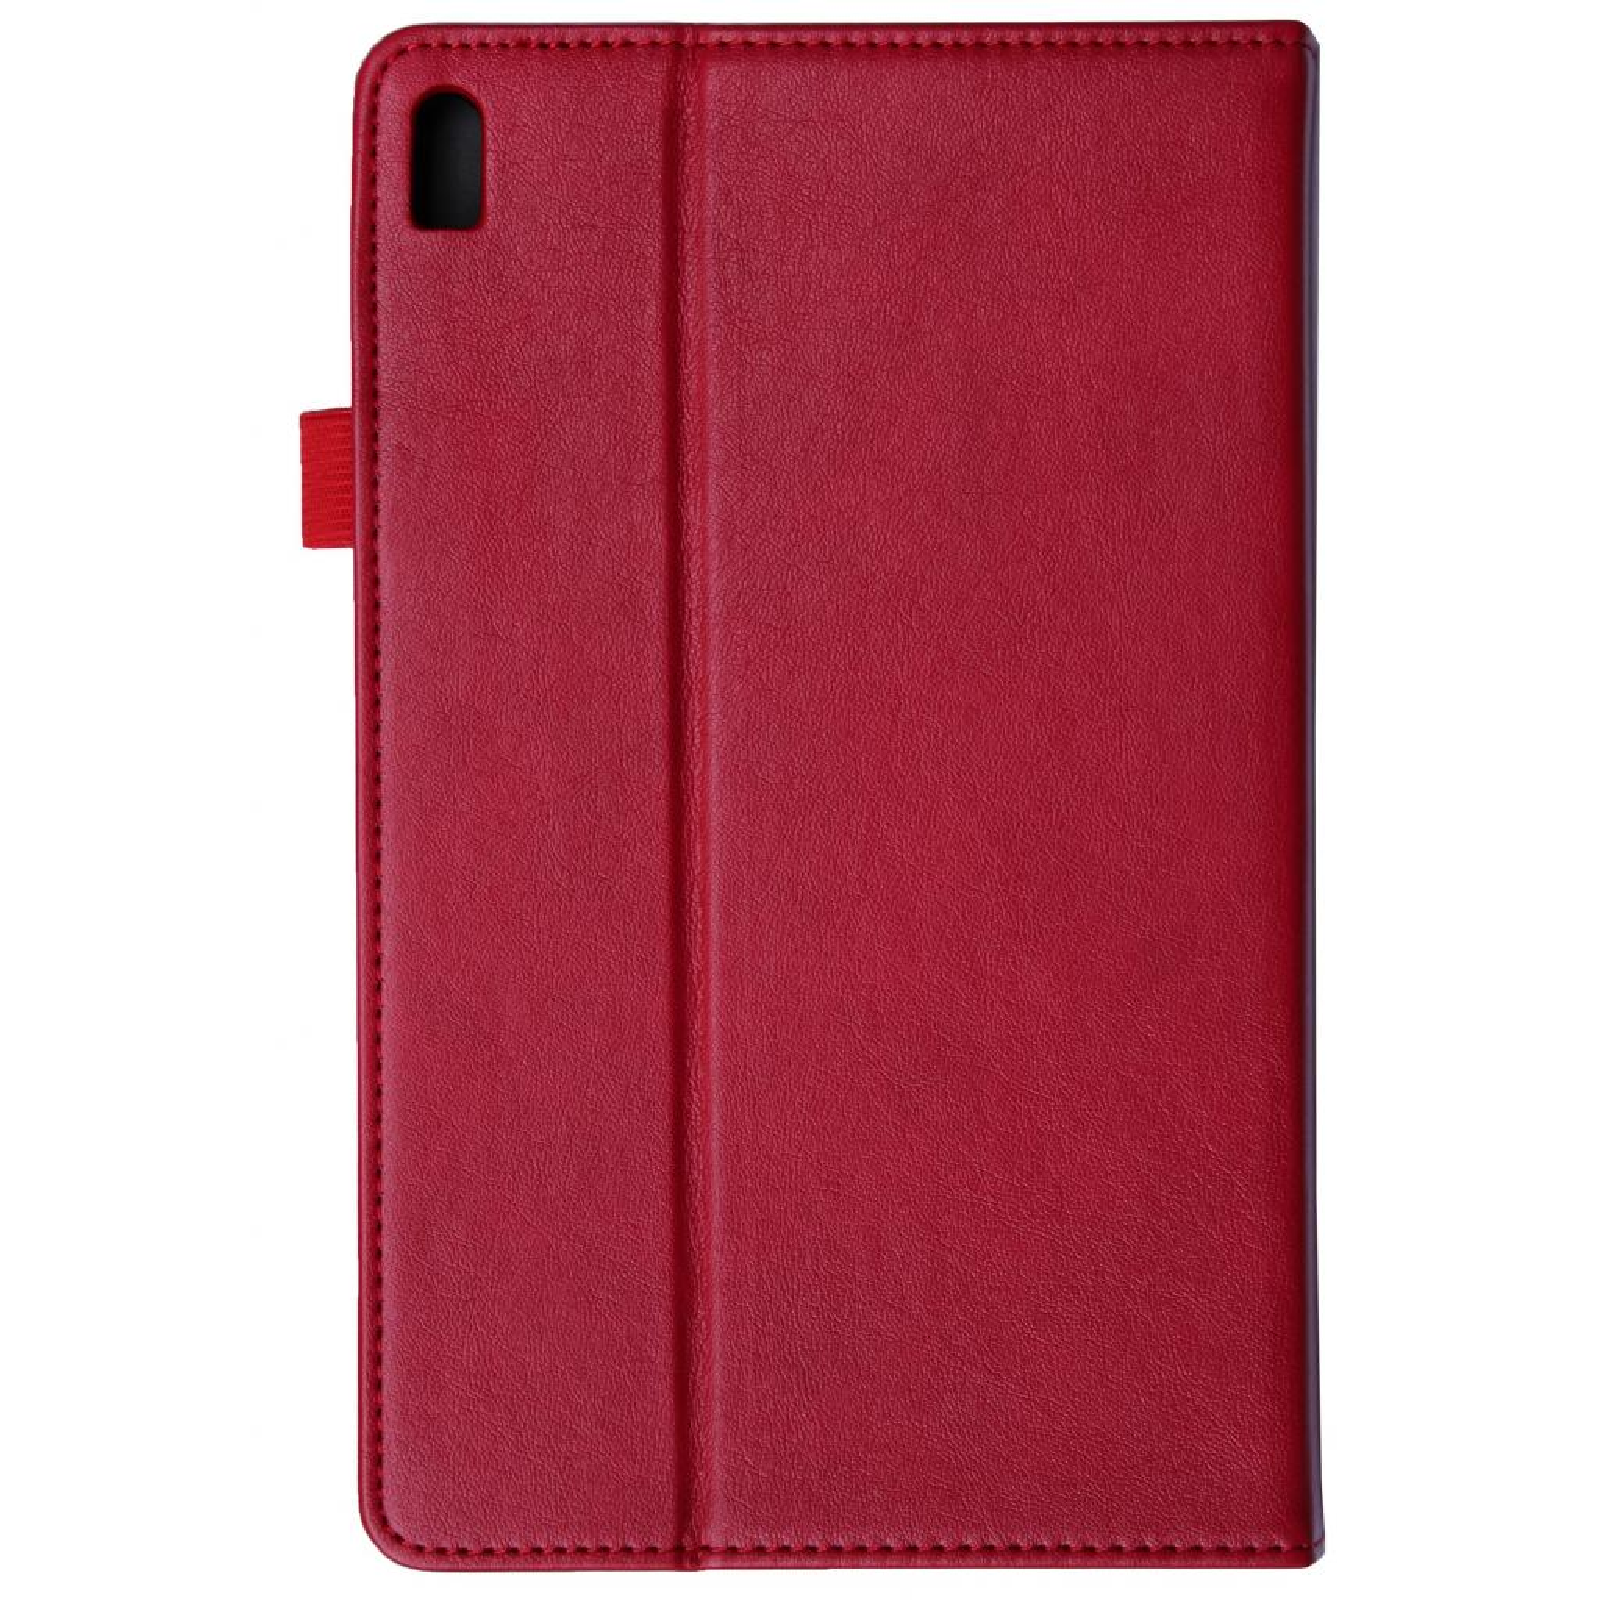 Чехол для планшета Grand-X для Lenovo TAB4 8 Plus TB-8704 Business Class Red (LTC-LT48PBR) изображение 3